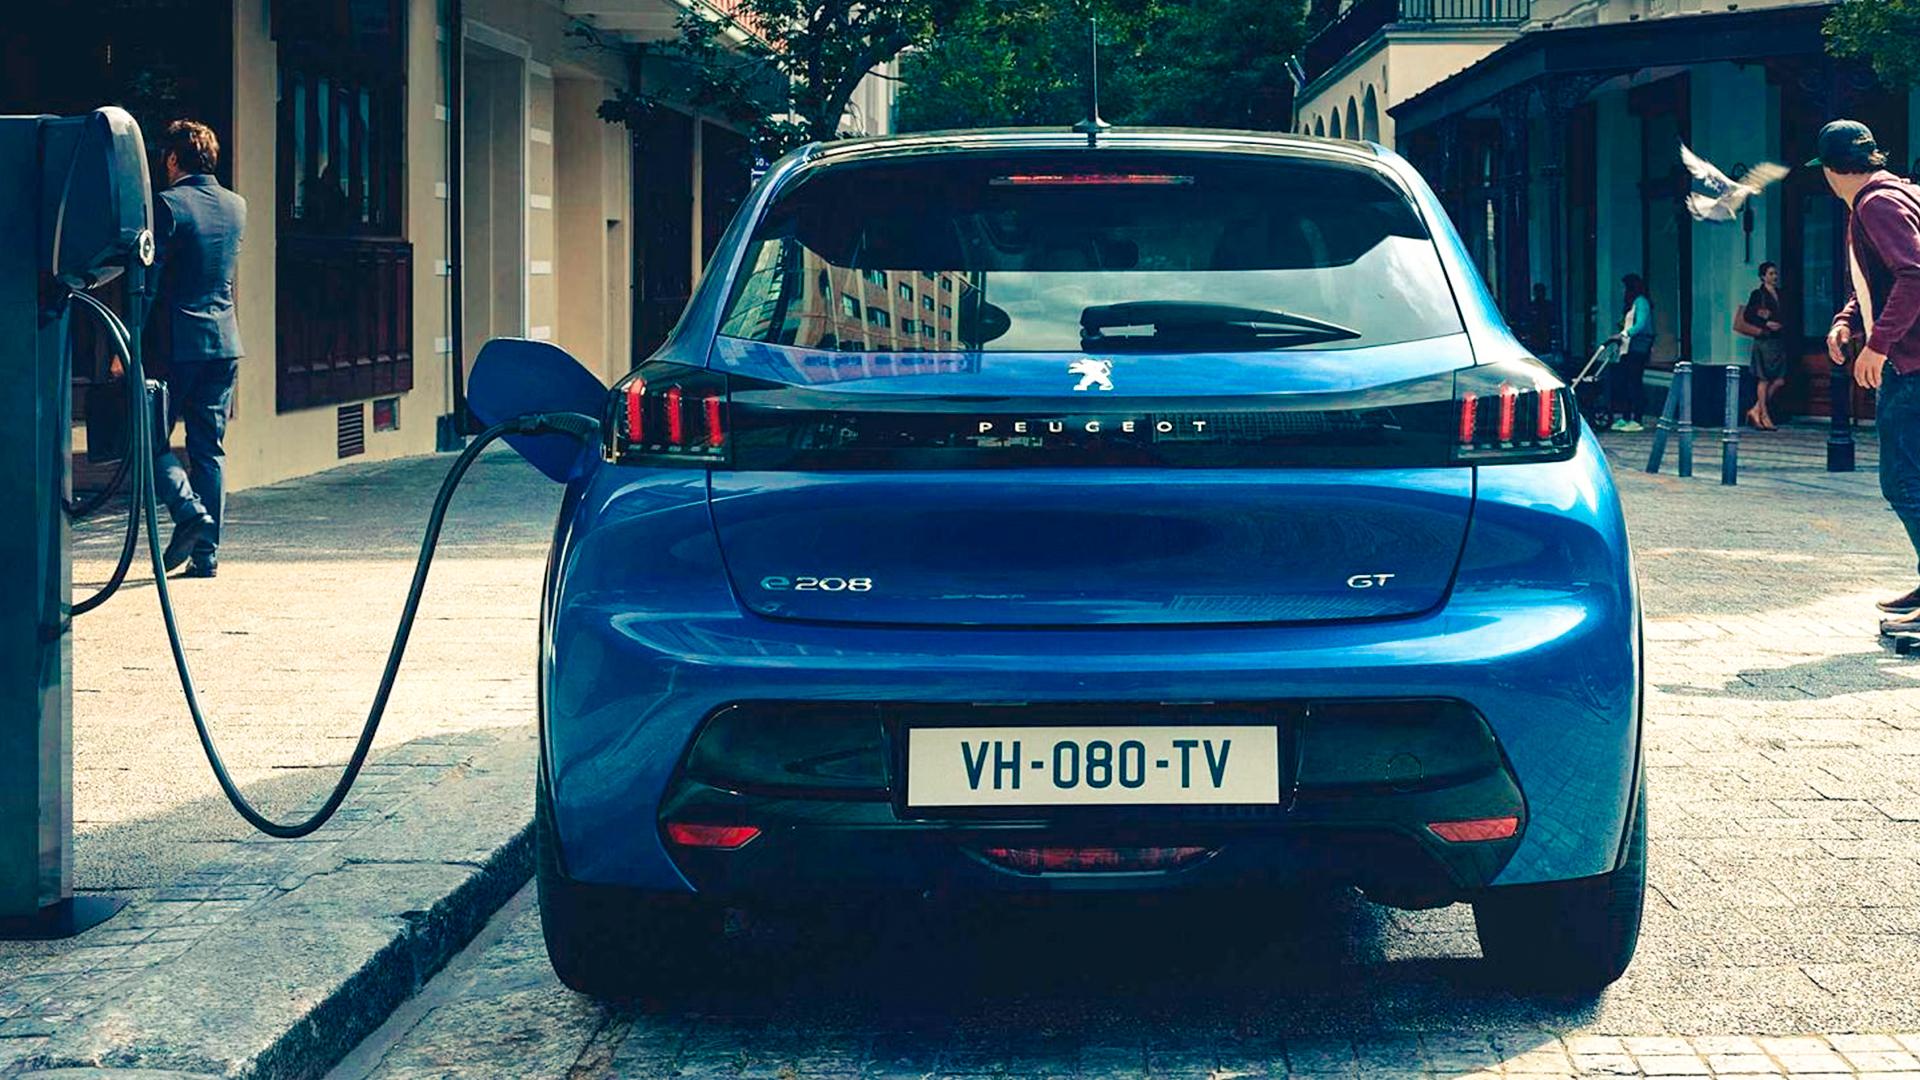 Novo Peugeot 208 elétrico na cor azul sendo recarregado